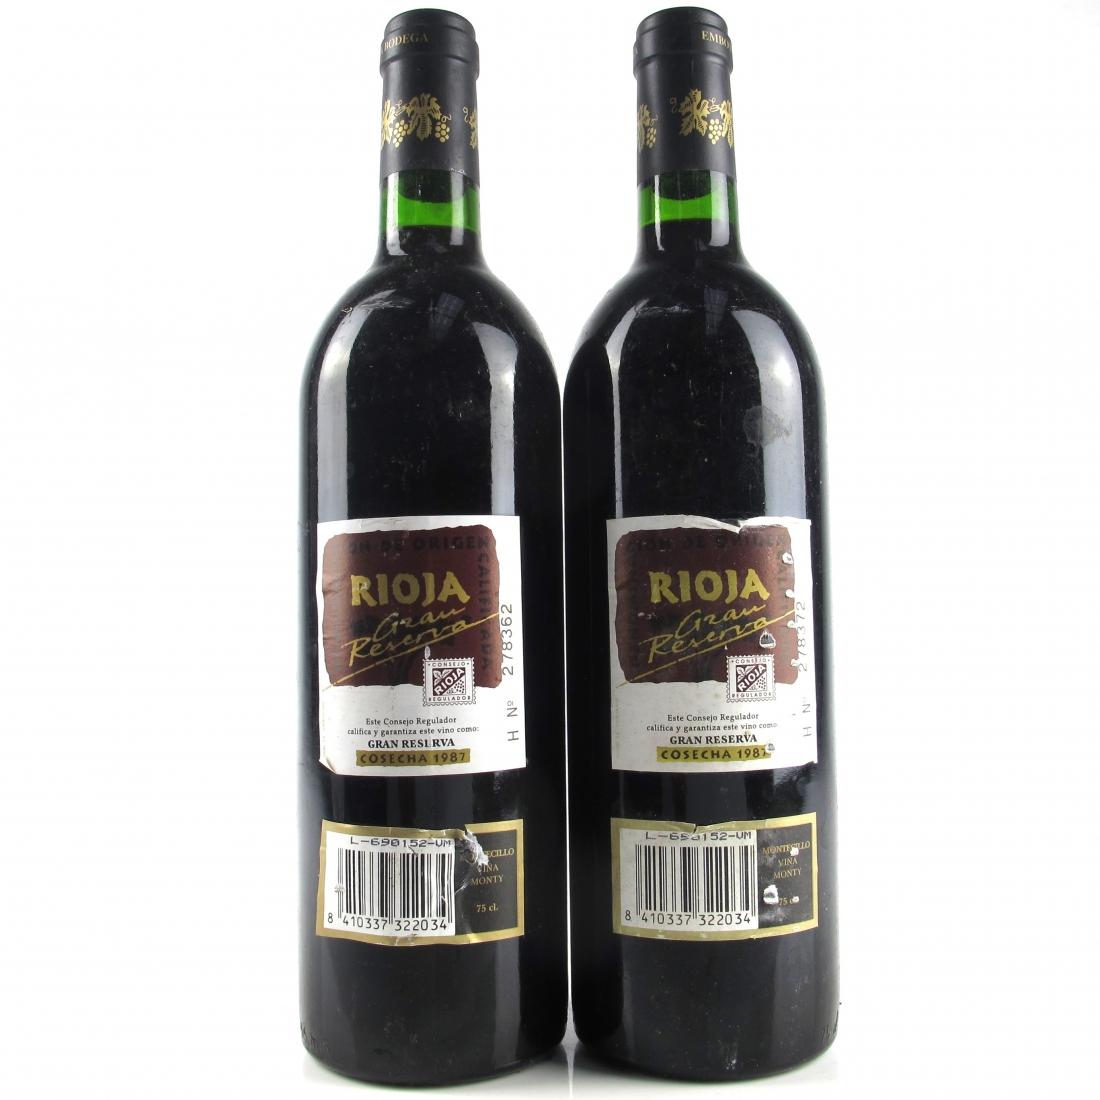 Viña Monty 1987 Rioja Gran Reserva 2x75cl